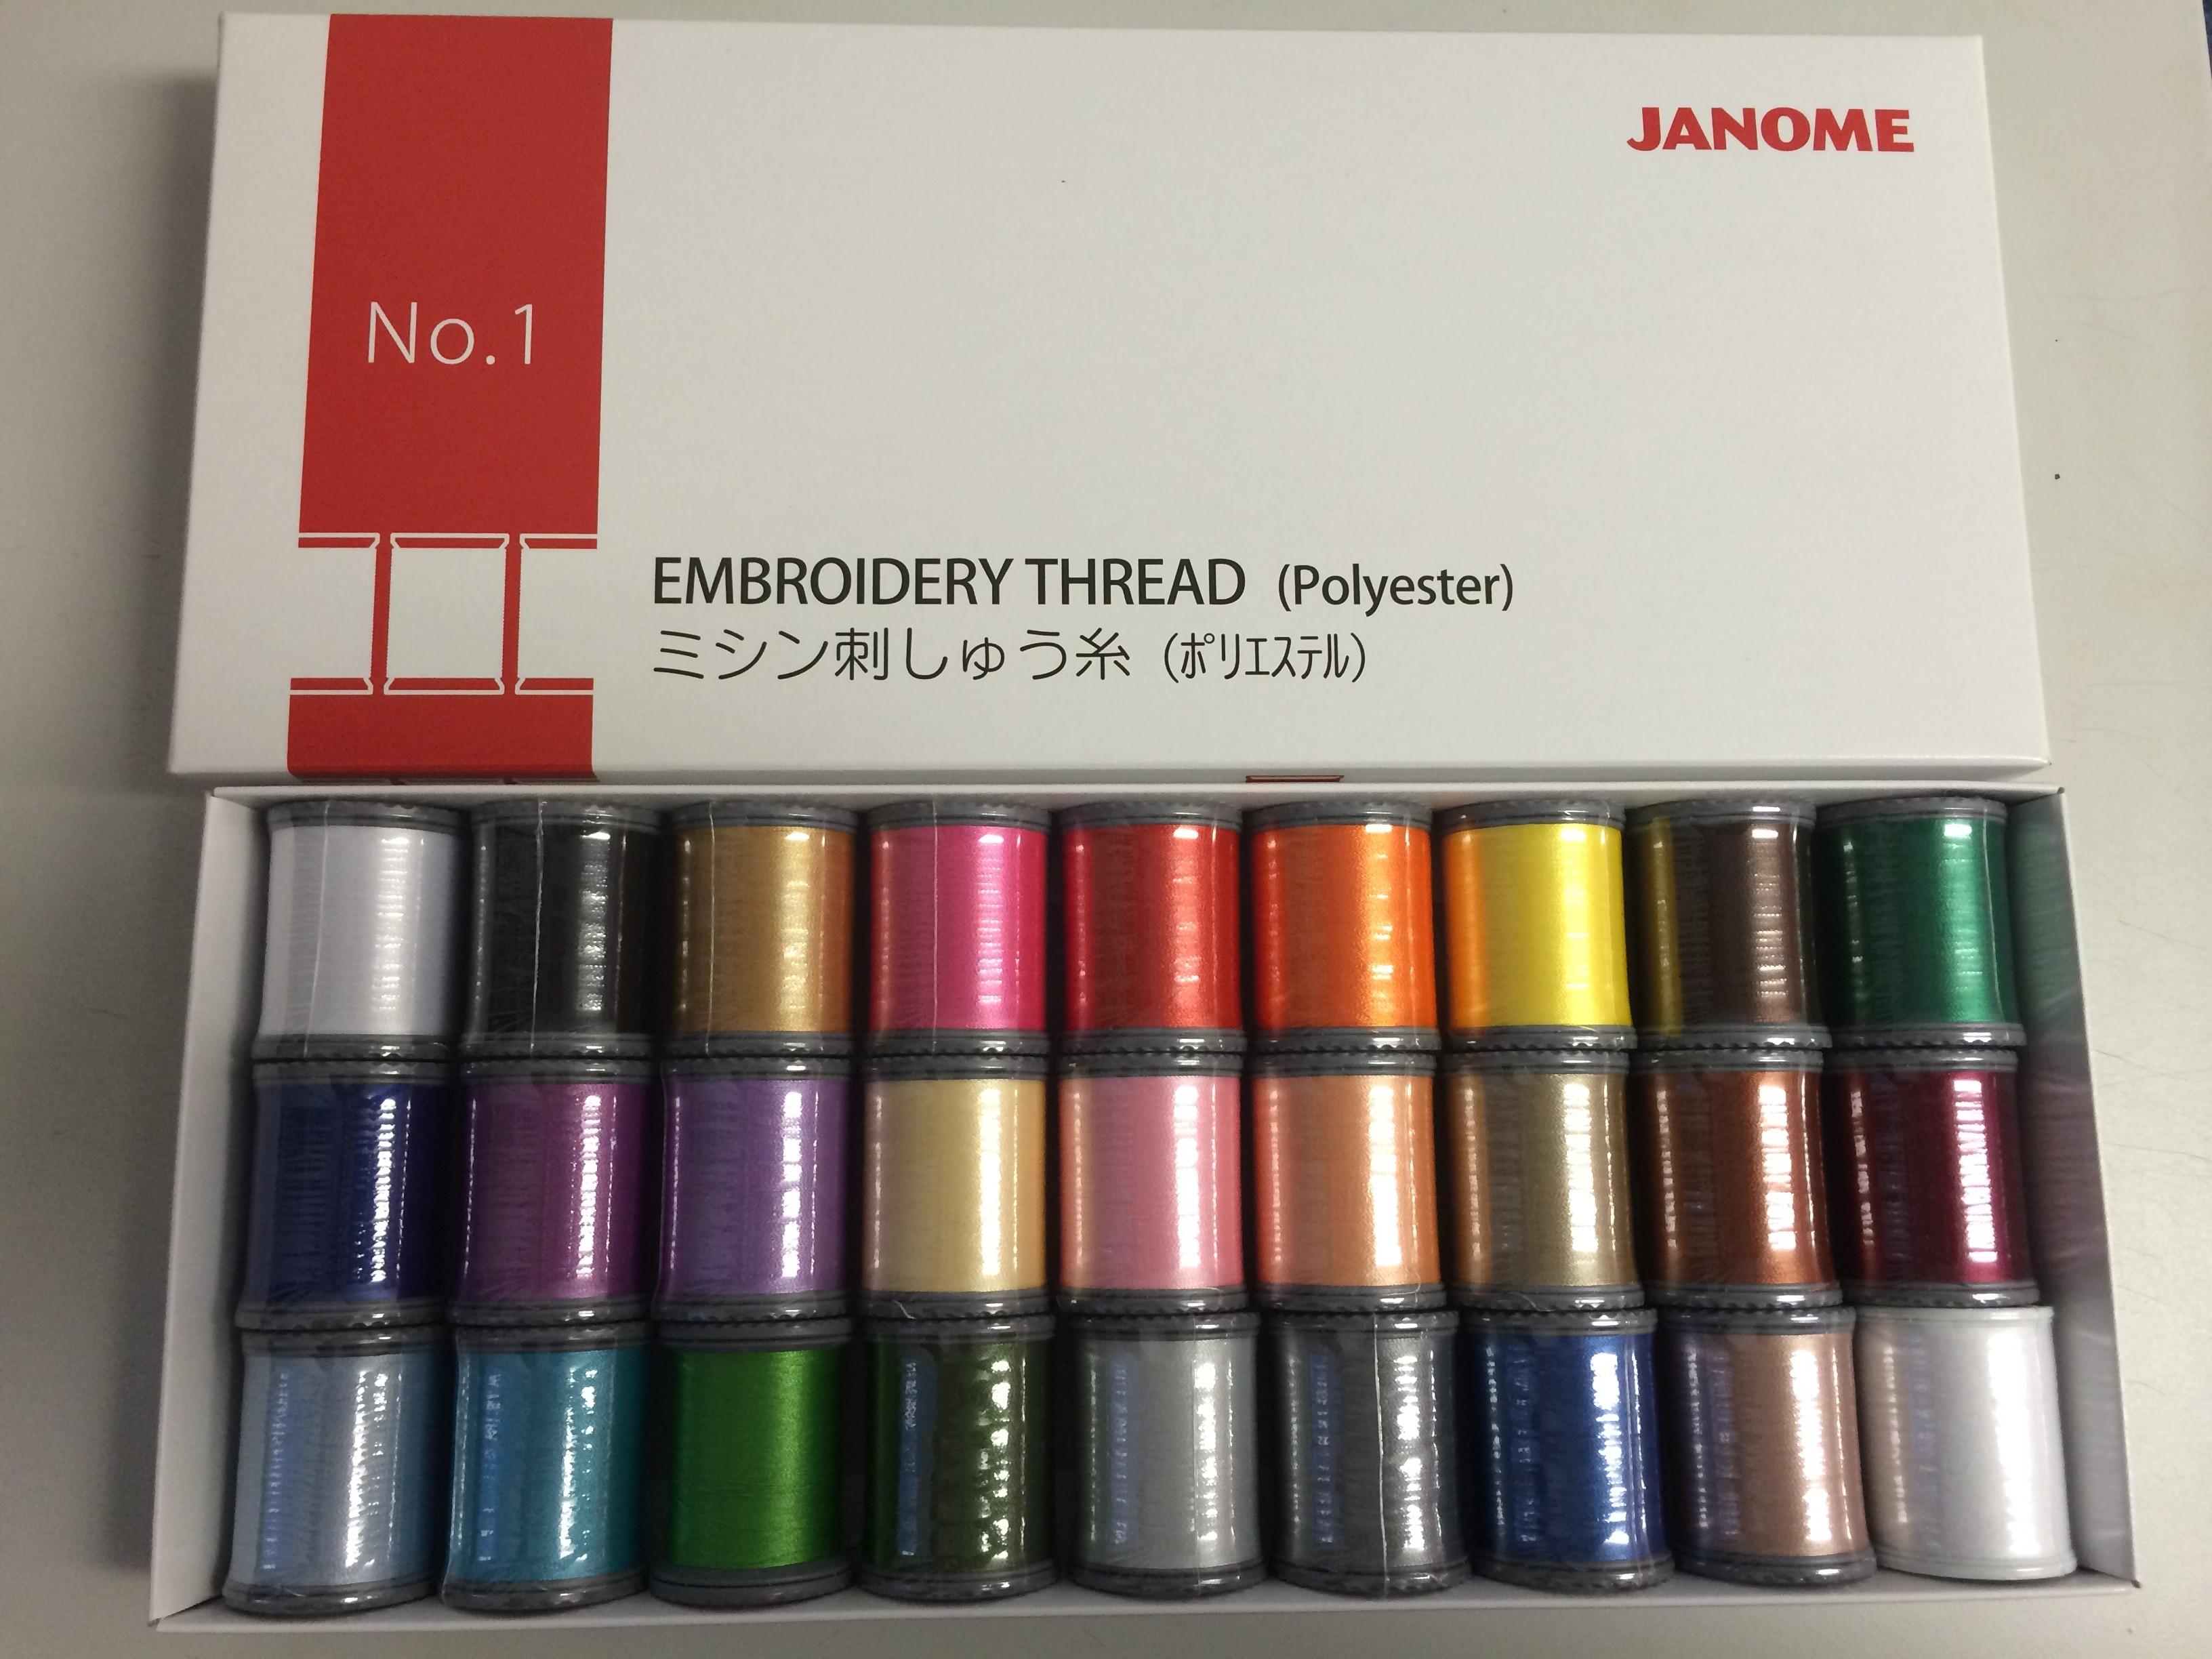 Janome Embroidery Thread (Box 1)